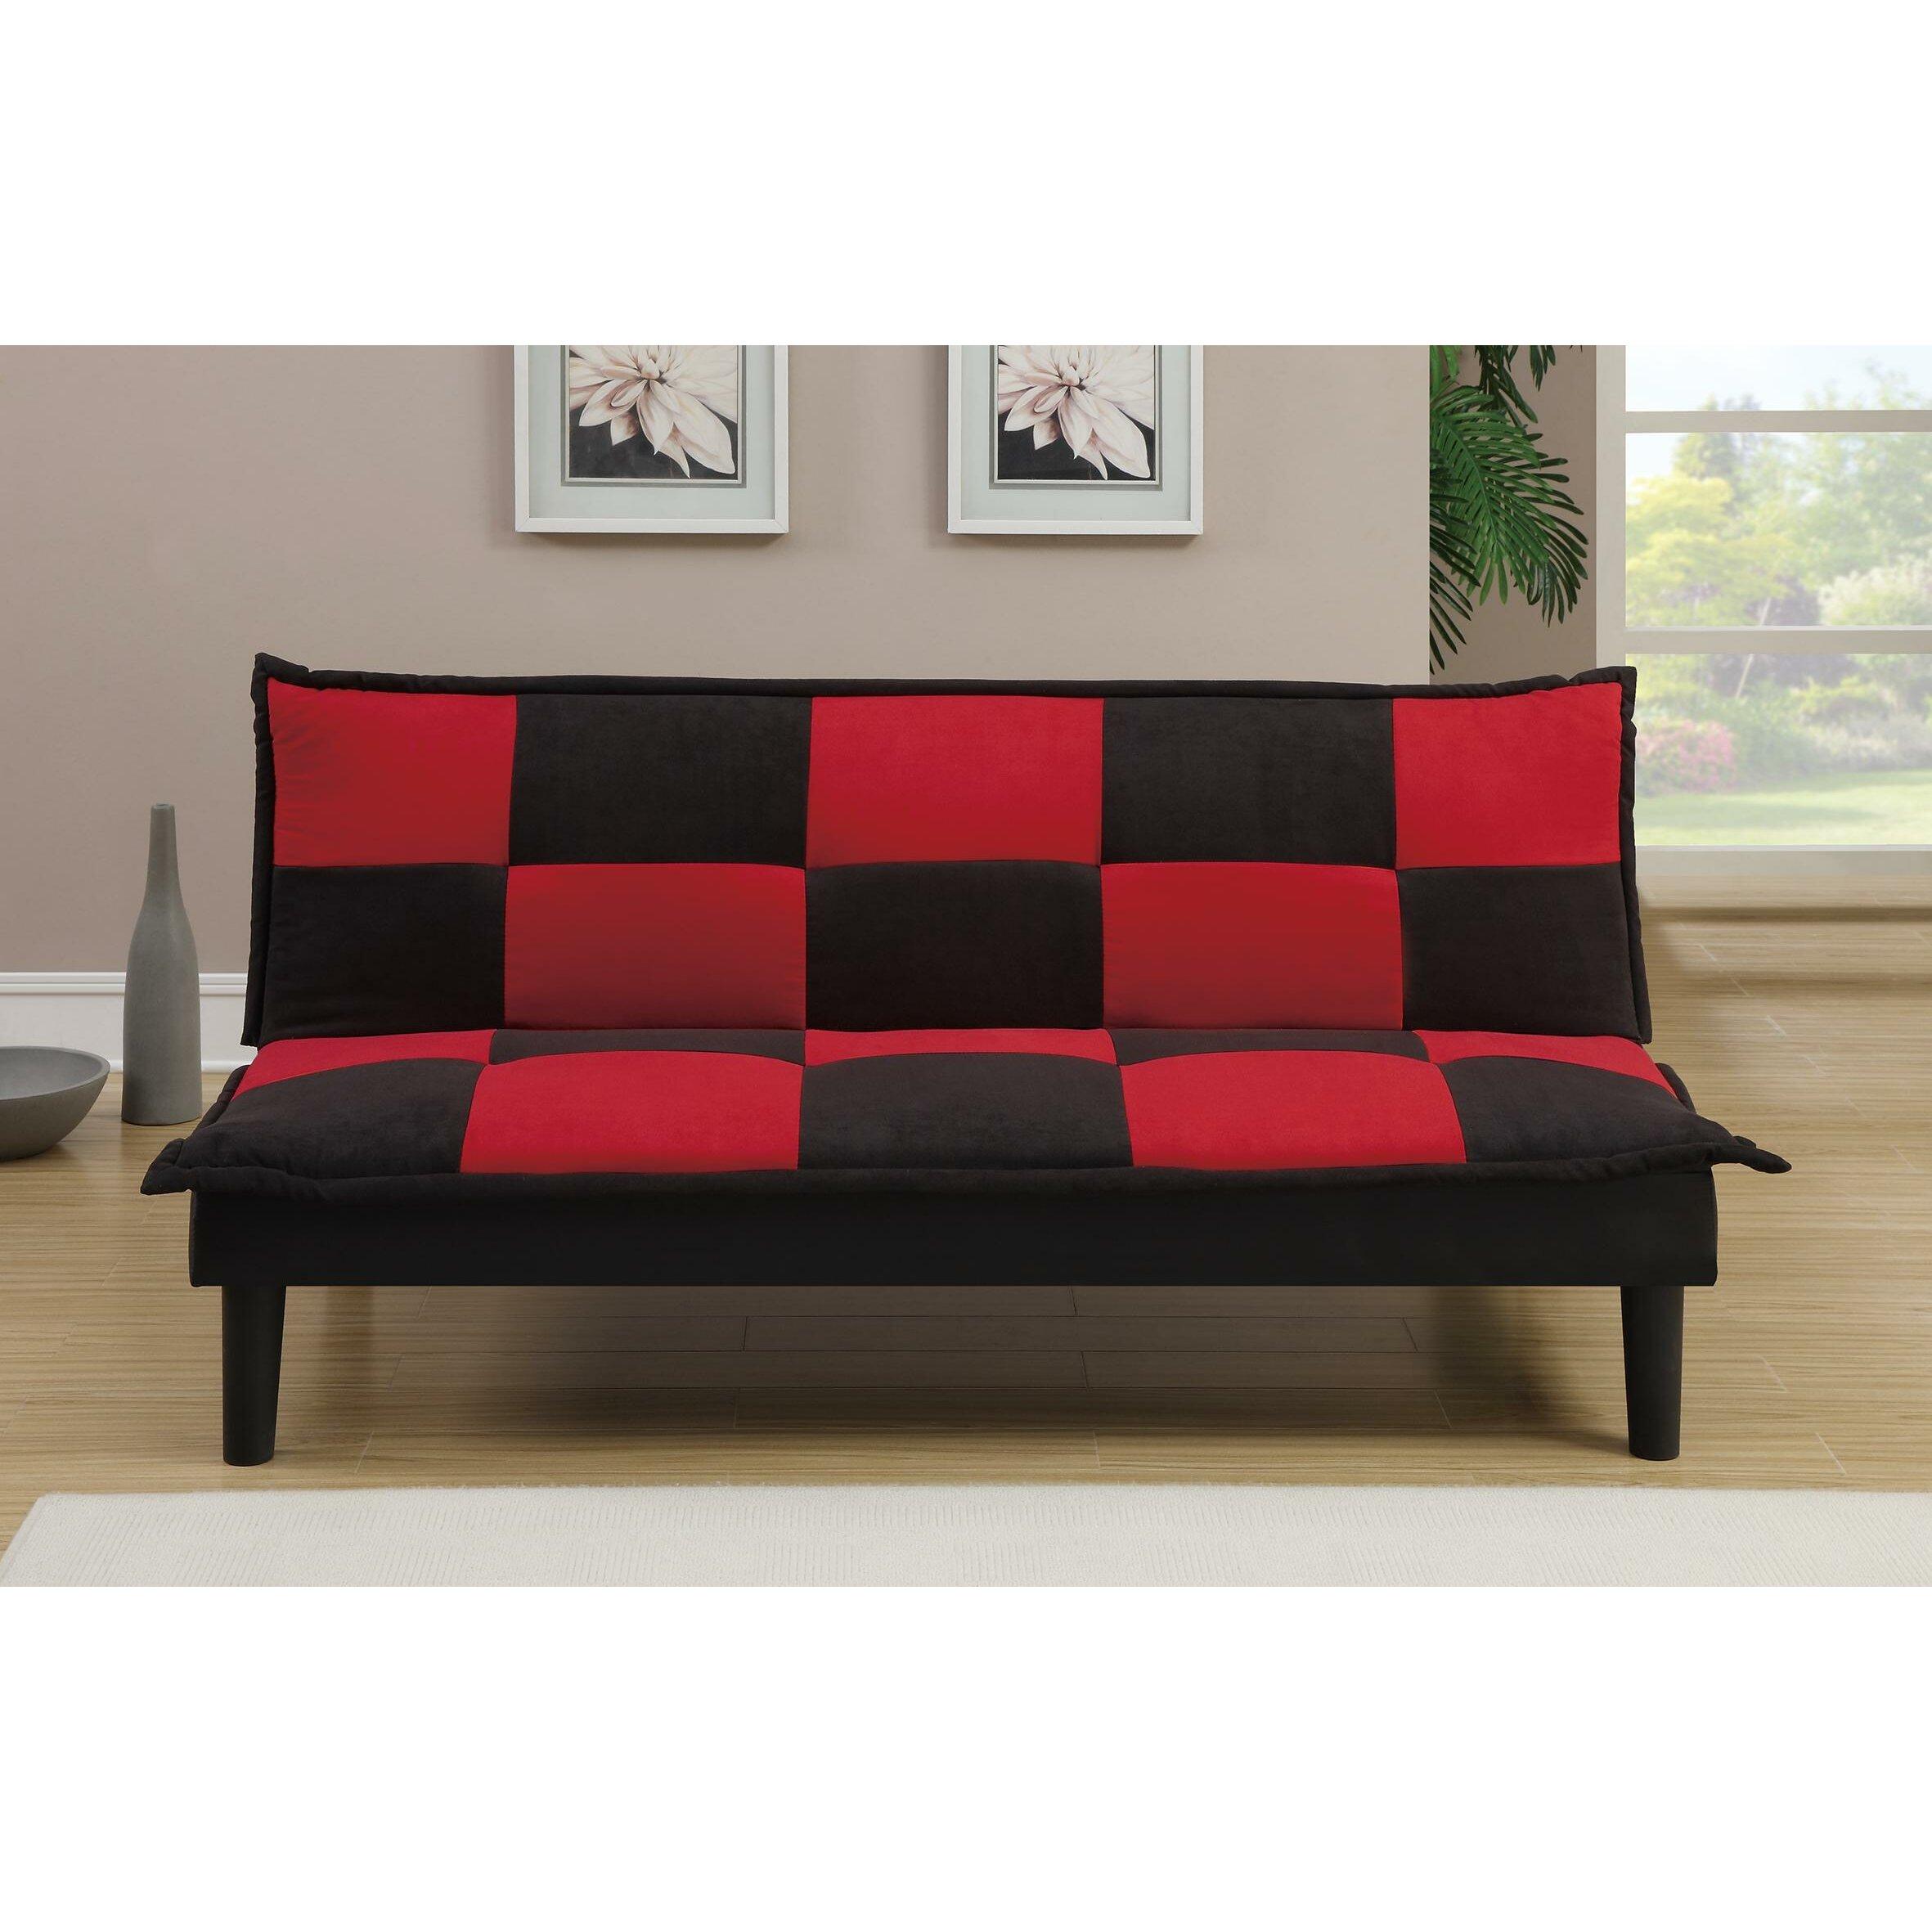 homes studio ventura adjustable sleeper sofa reviews wayfair